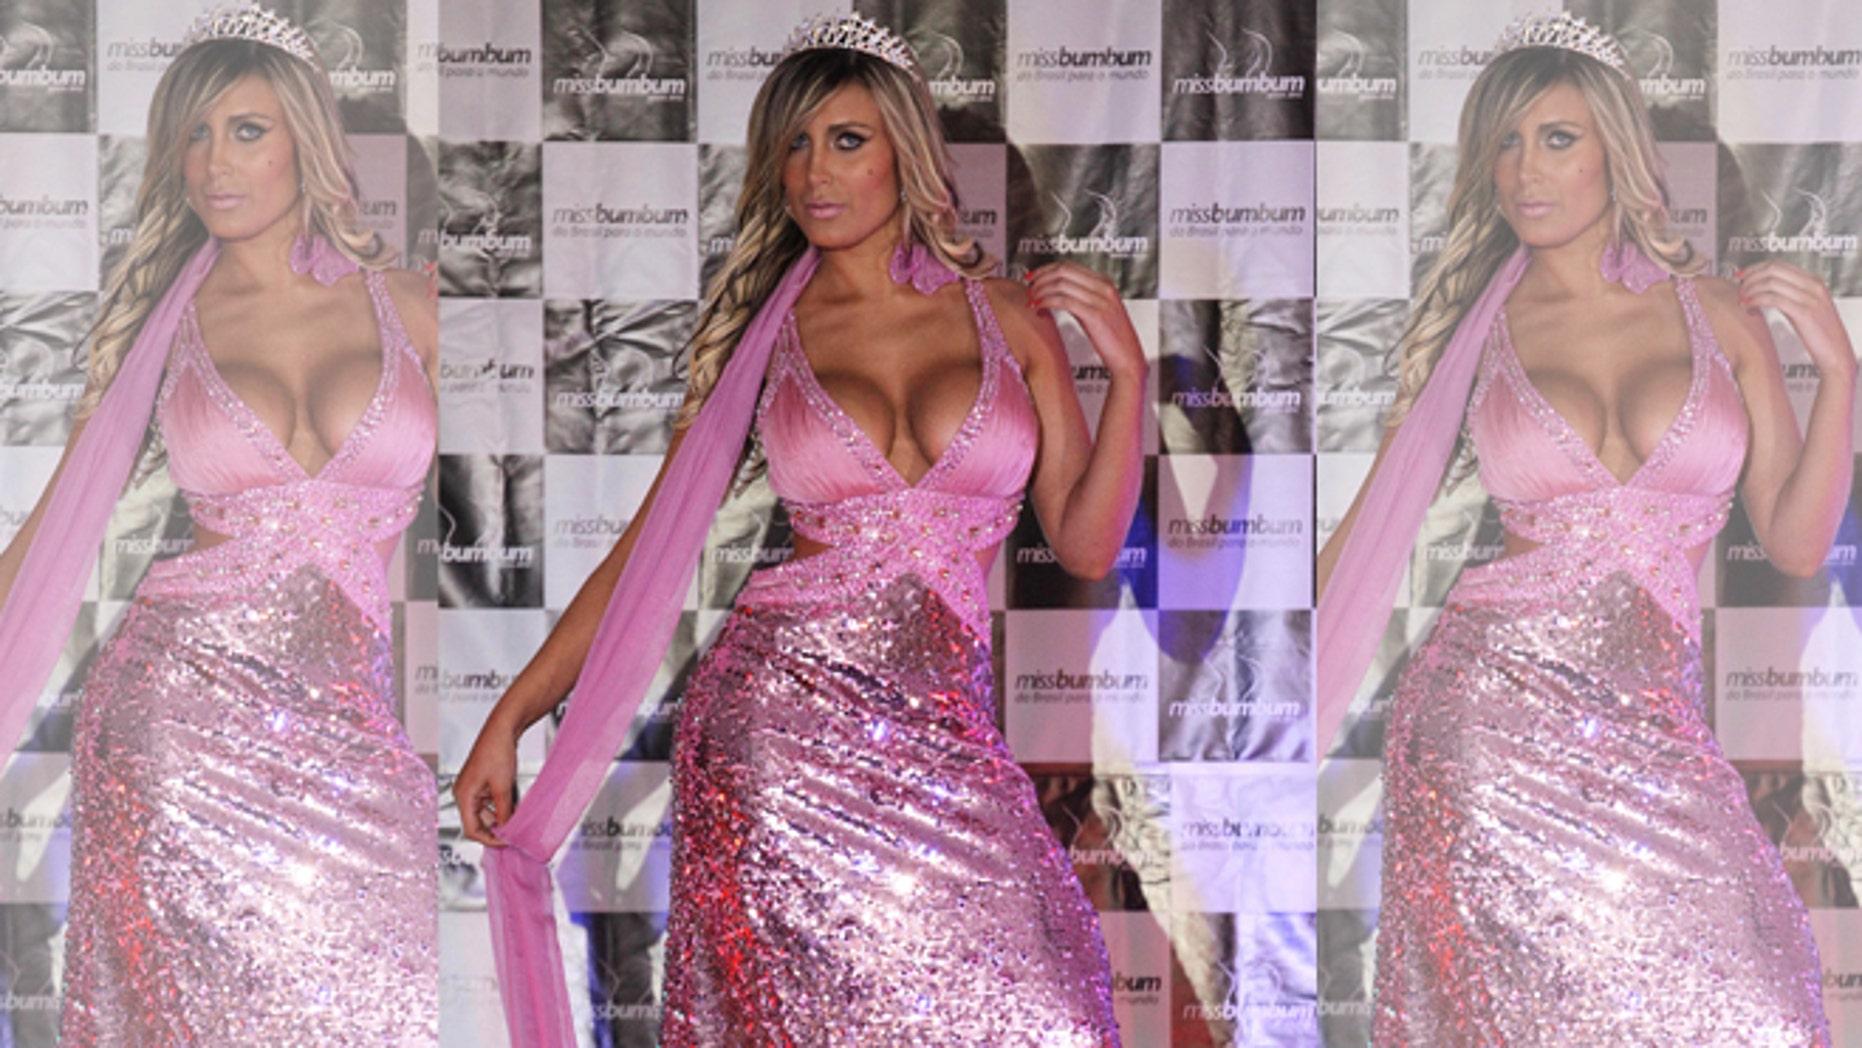 Andressa Urach in the 2012 Miss Bumbum Brazil contest in Sao Paulo, Brazil.